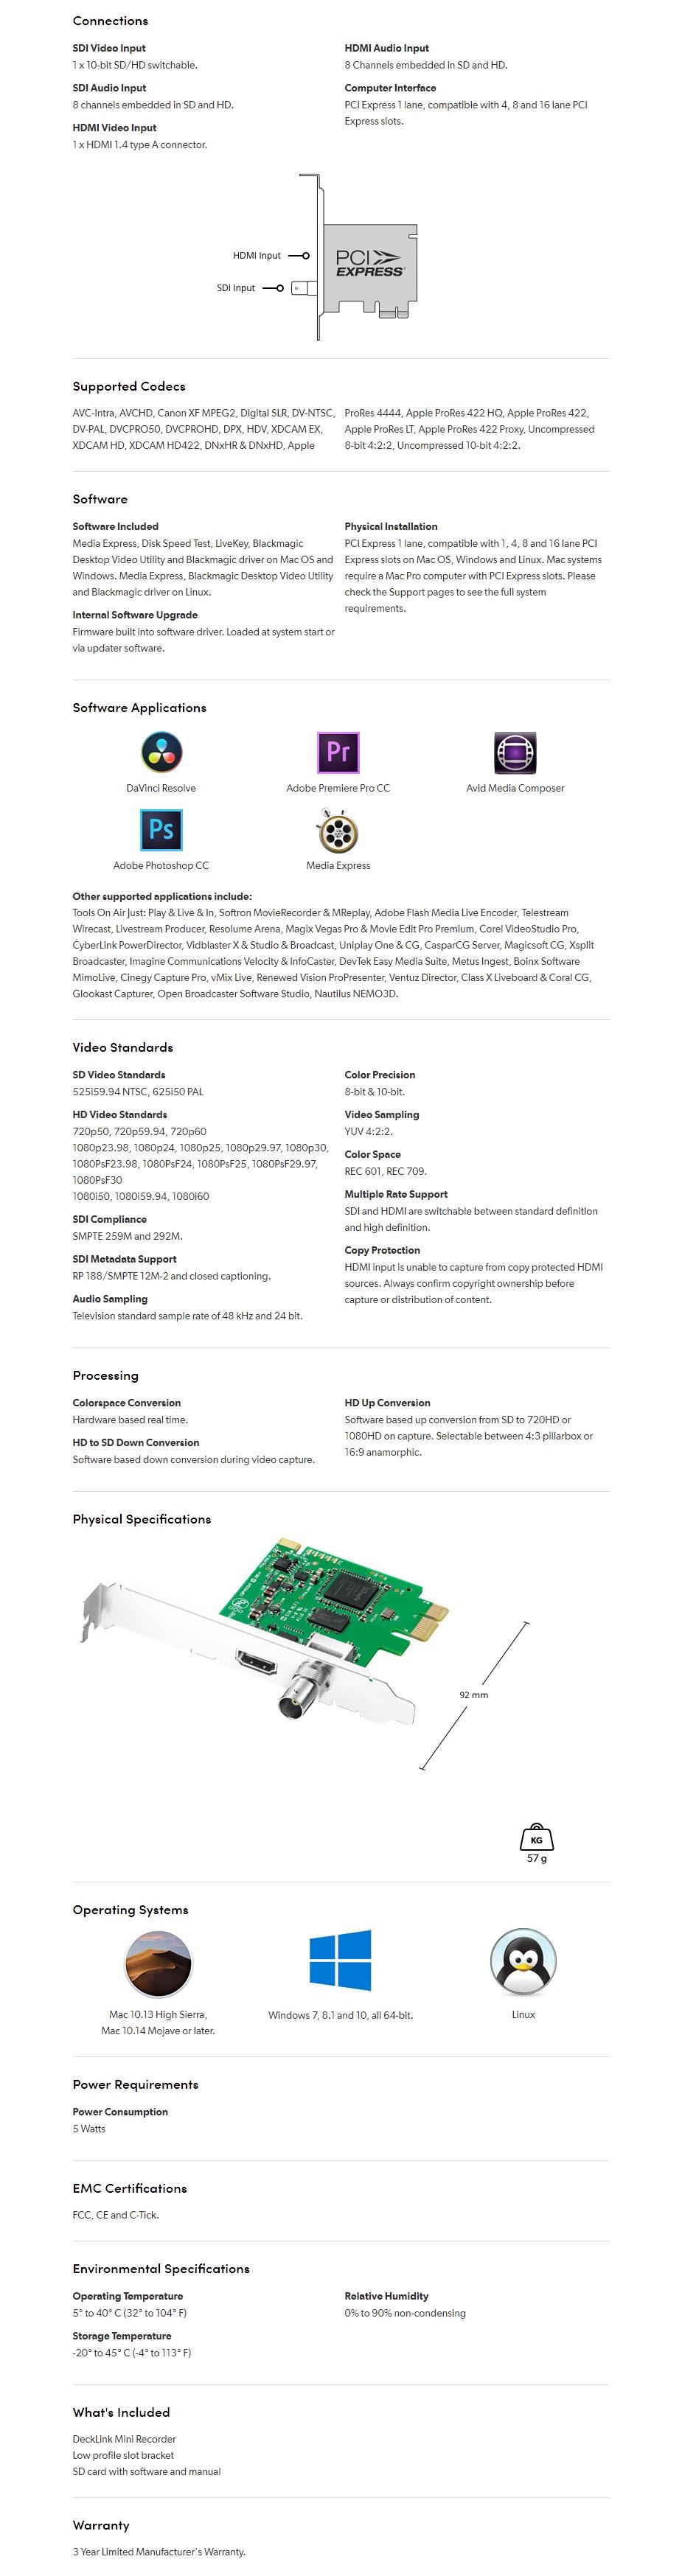 Blackmagic Design DeckLink Mini Recorder - Overview 1